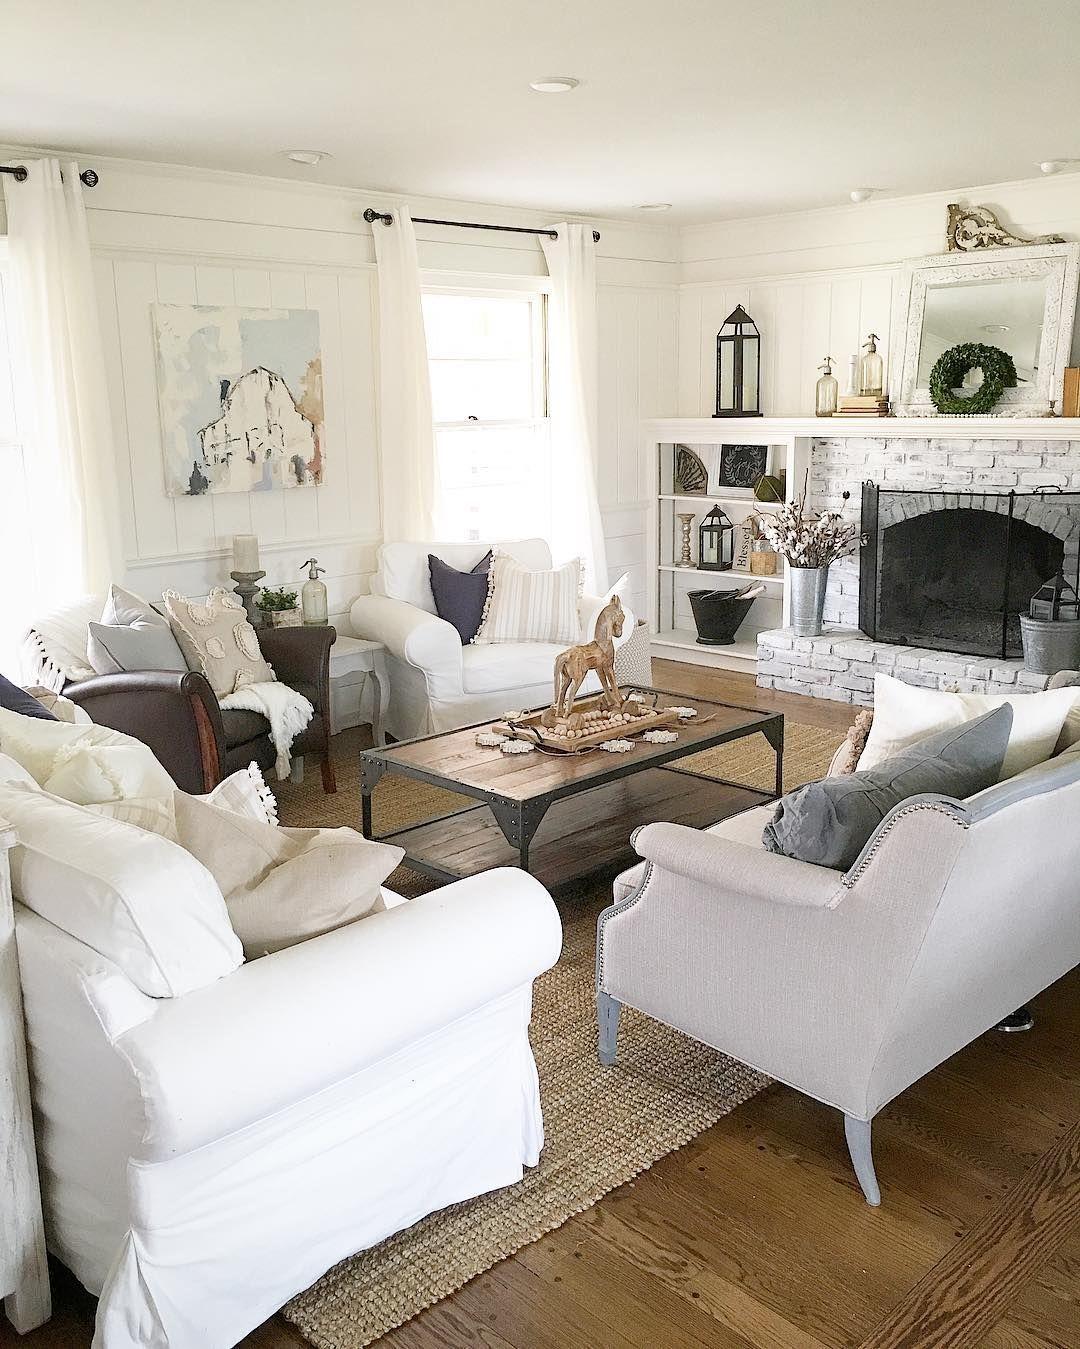 Such a cozy setup | Cottage style | Pinterest | Cozy, Living rooms ...